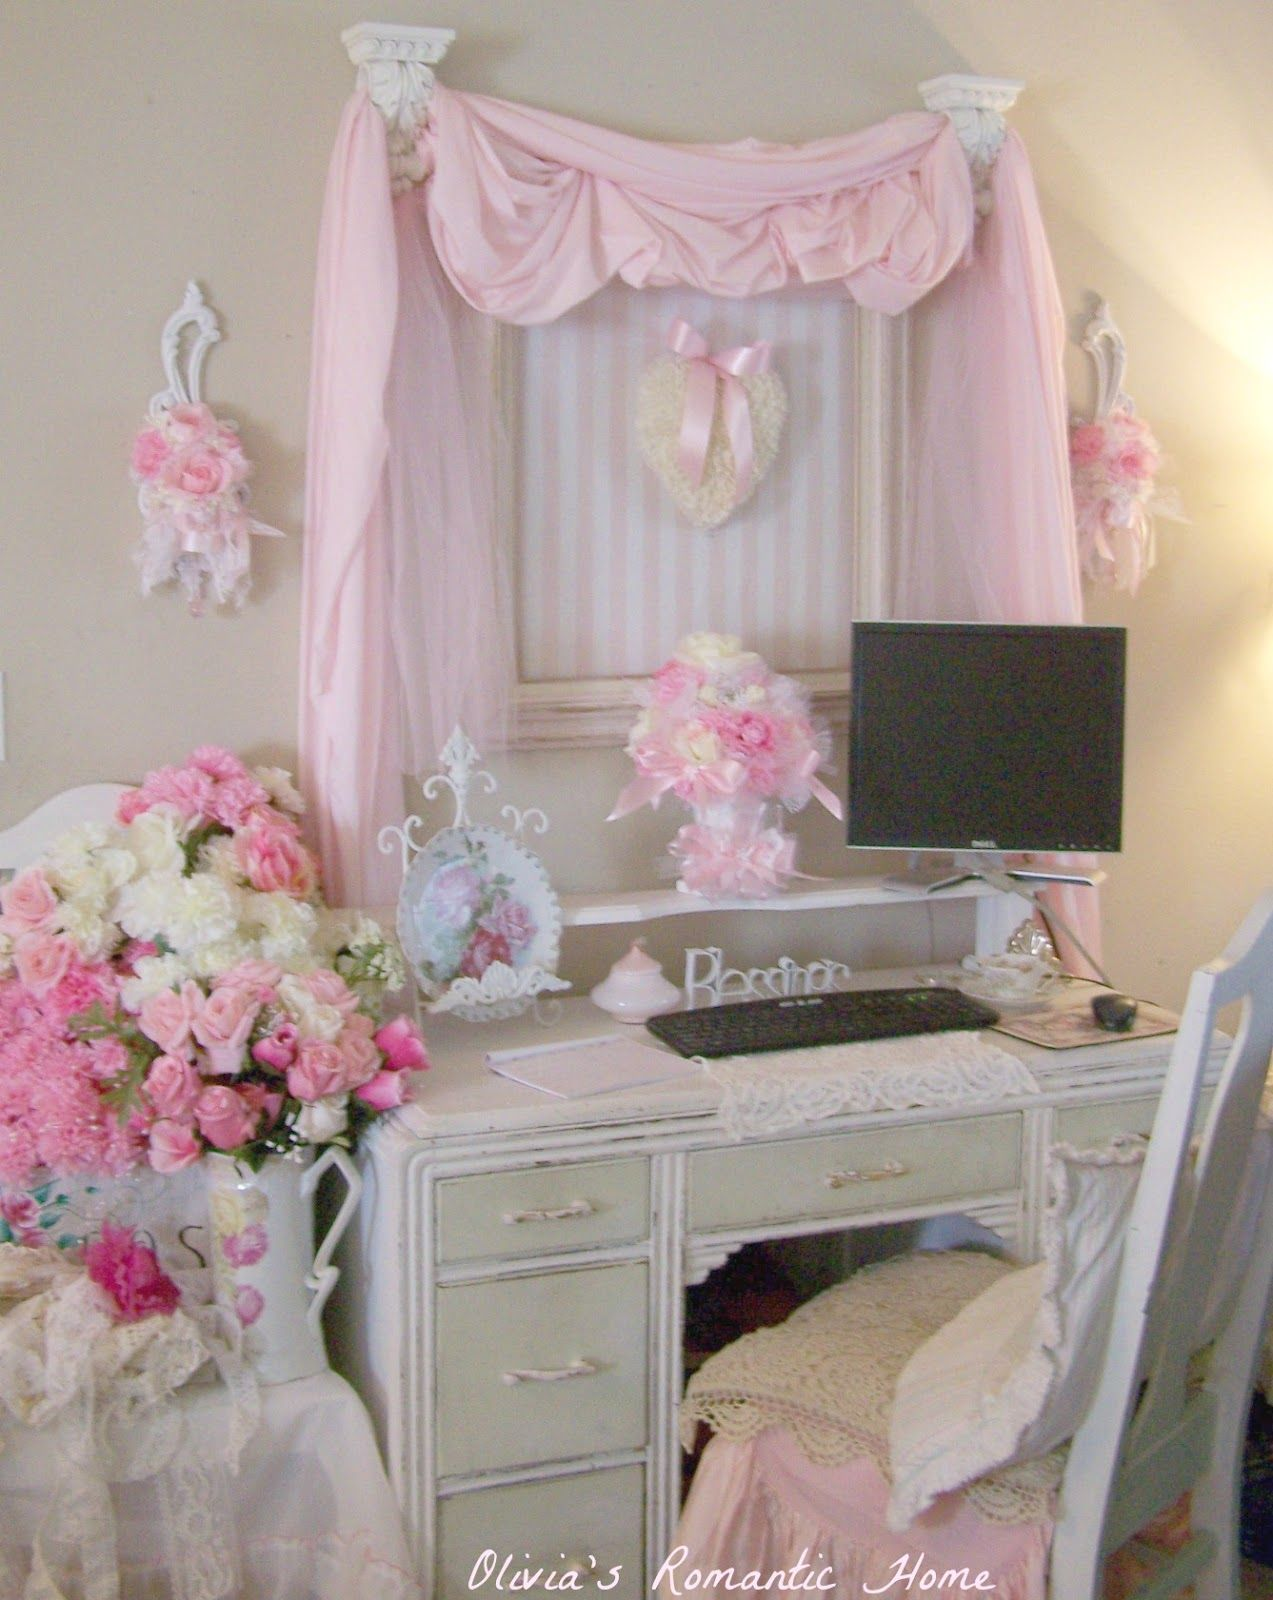 Shabby Chic Decorating:wonderful Bedroom Shabby Chic Home Office Decor Shabby  Chic Bedroom Ideas